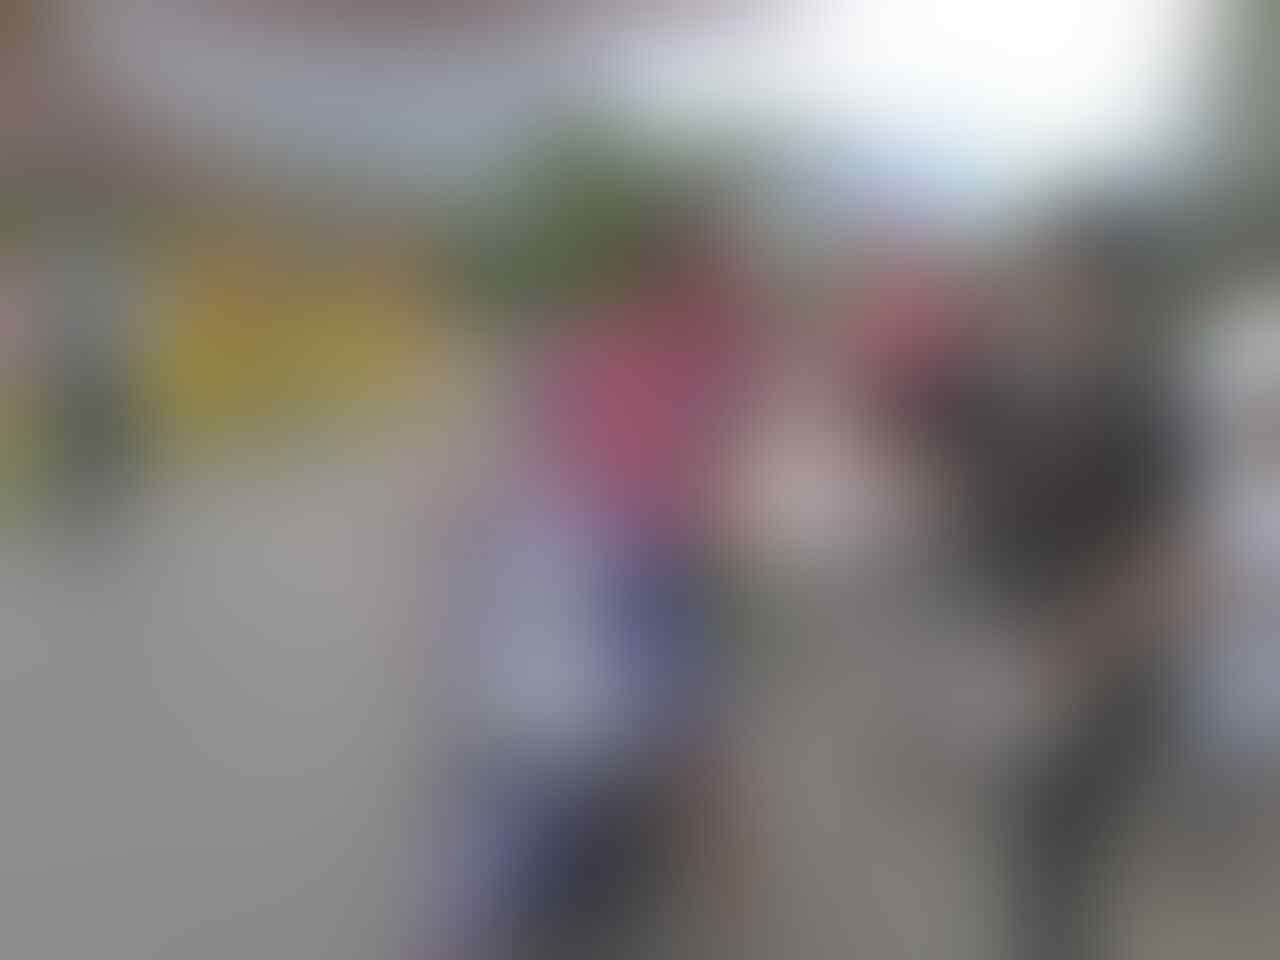 [Undangan] Kaskus Cendolin 2nd 2016 Regional Bengkulu